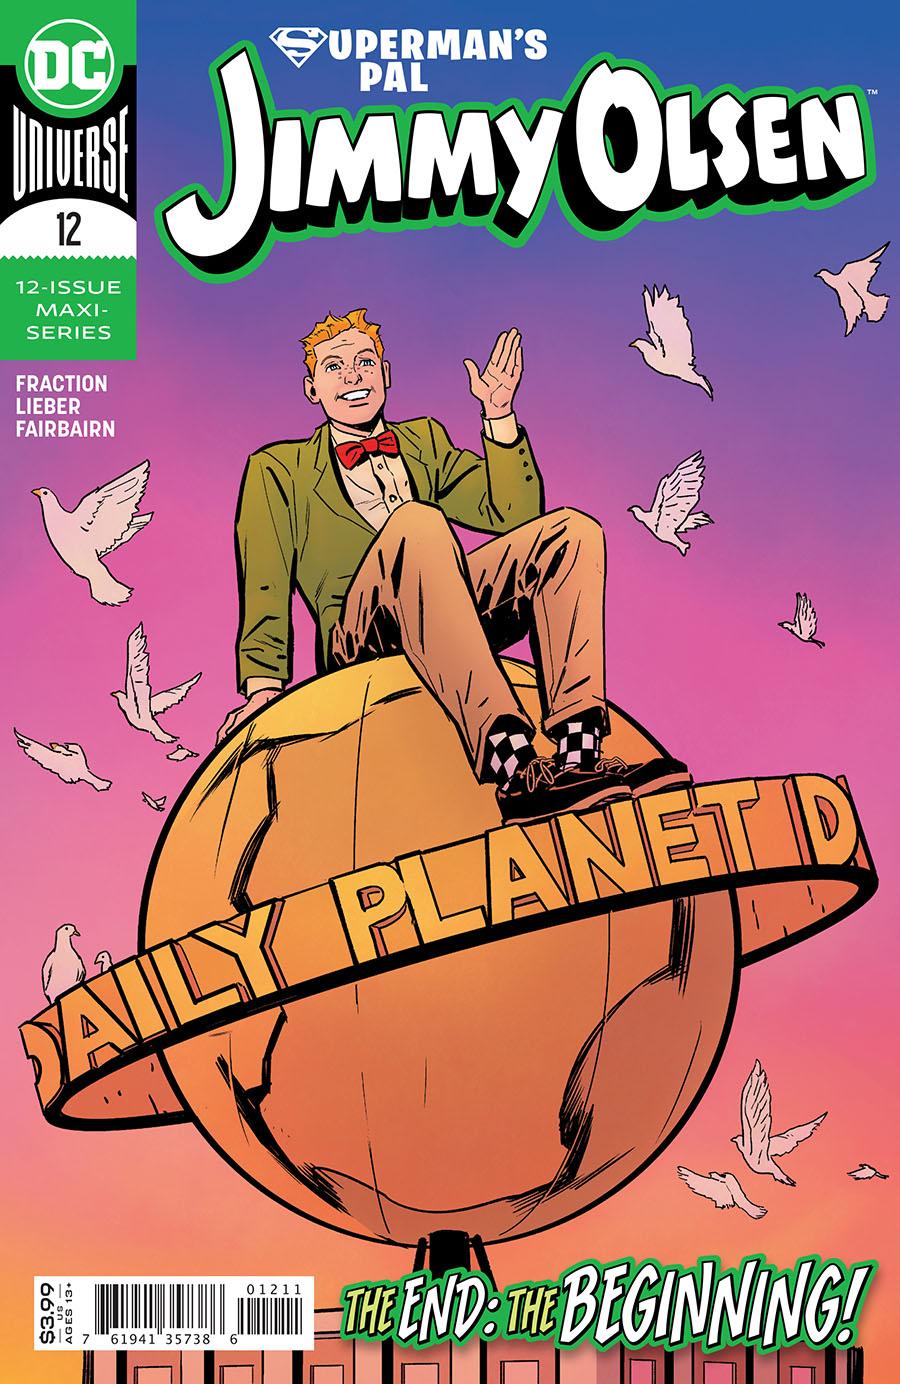 Supermans Pal Jimmy Olsen Vol 2 #12 Cover A Regular Steve Lieber Cover